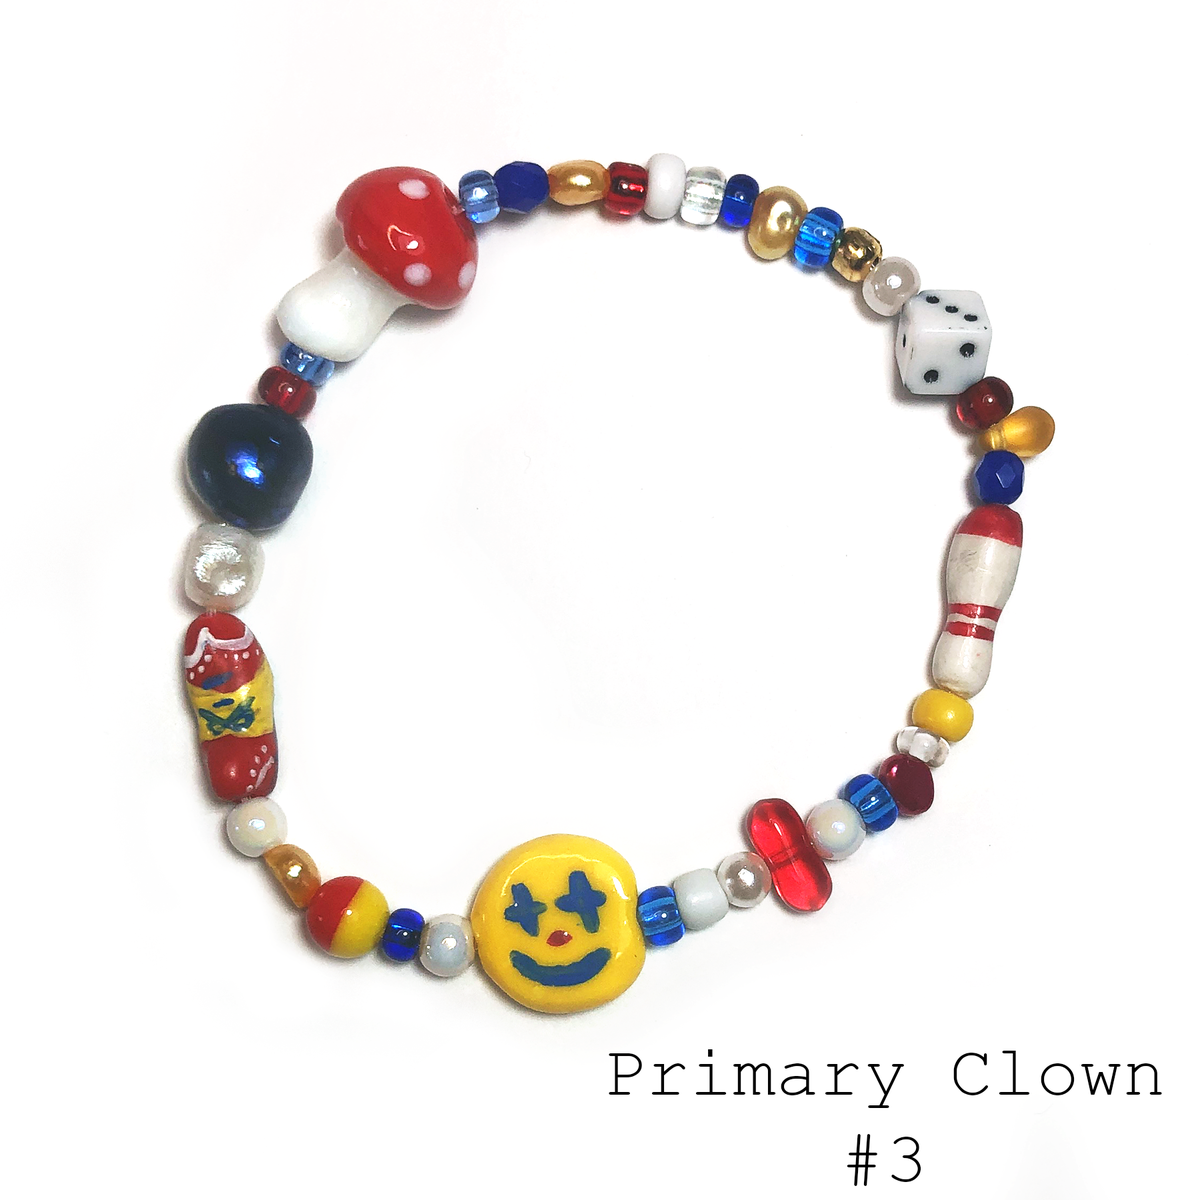 Image of Primary Clown Bracelet